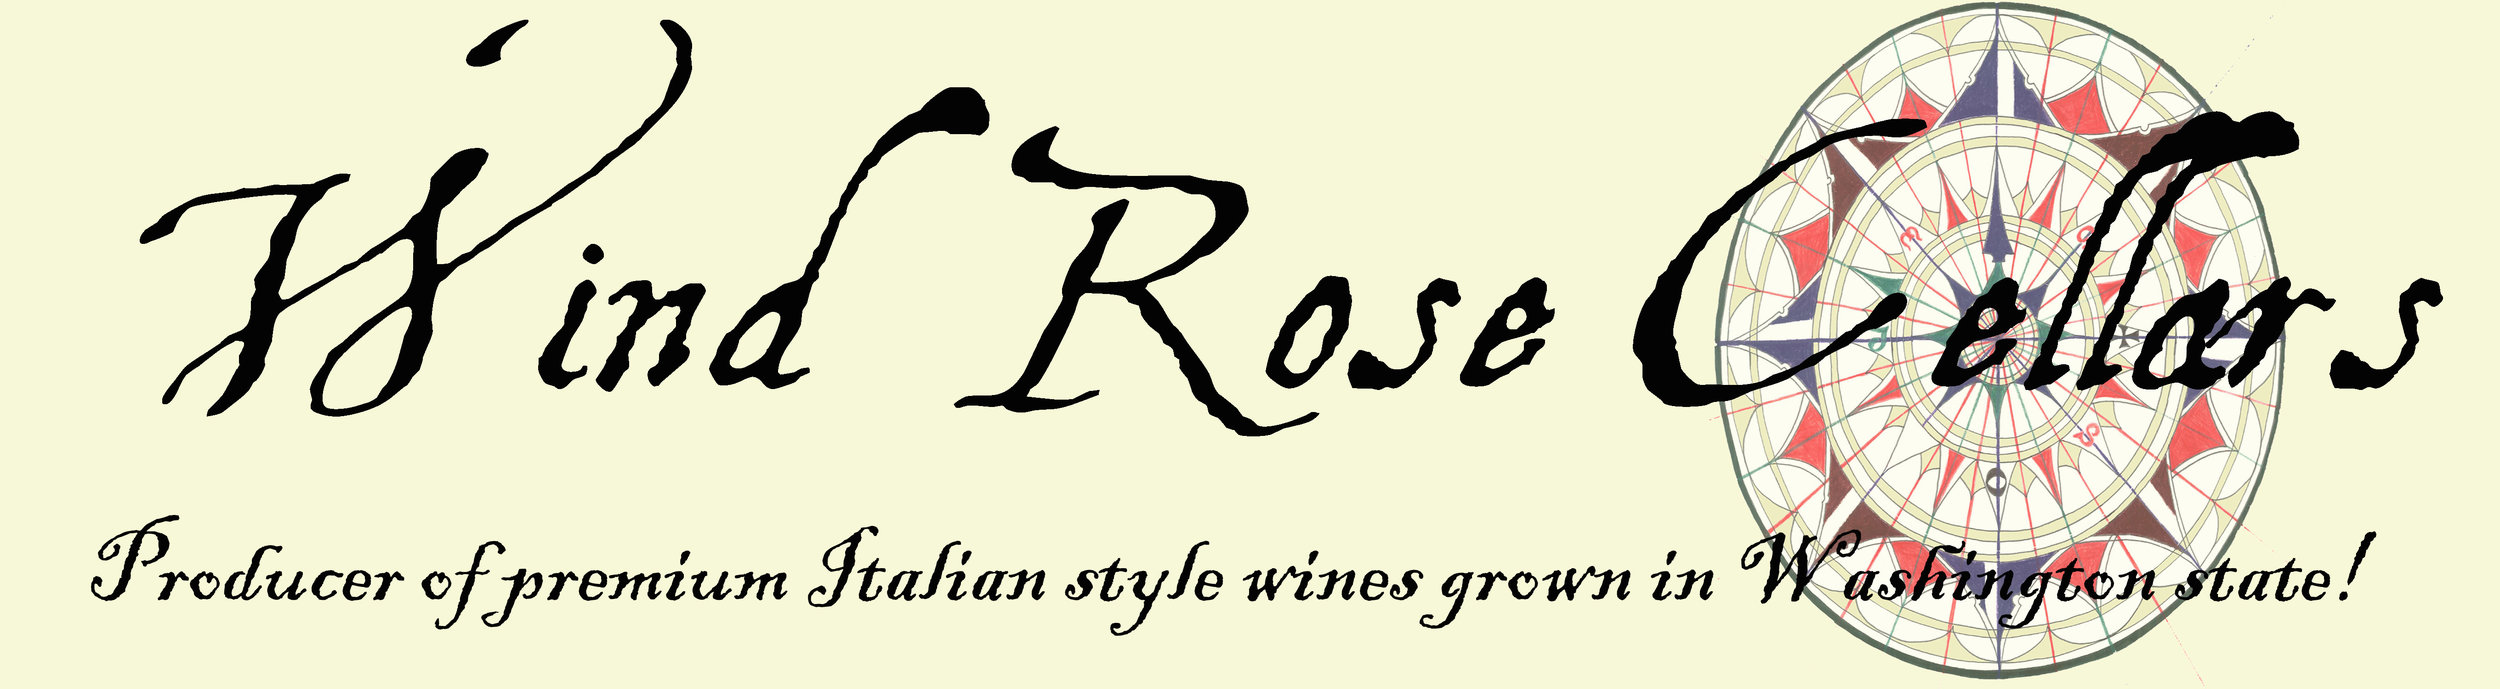 brochure wind rose logo copy.jpg